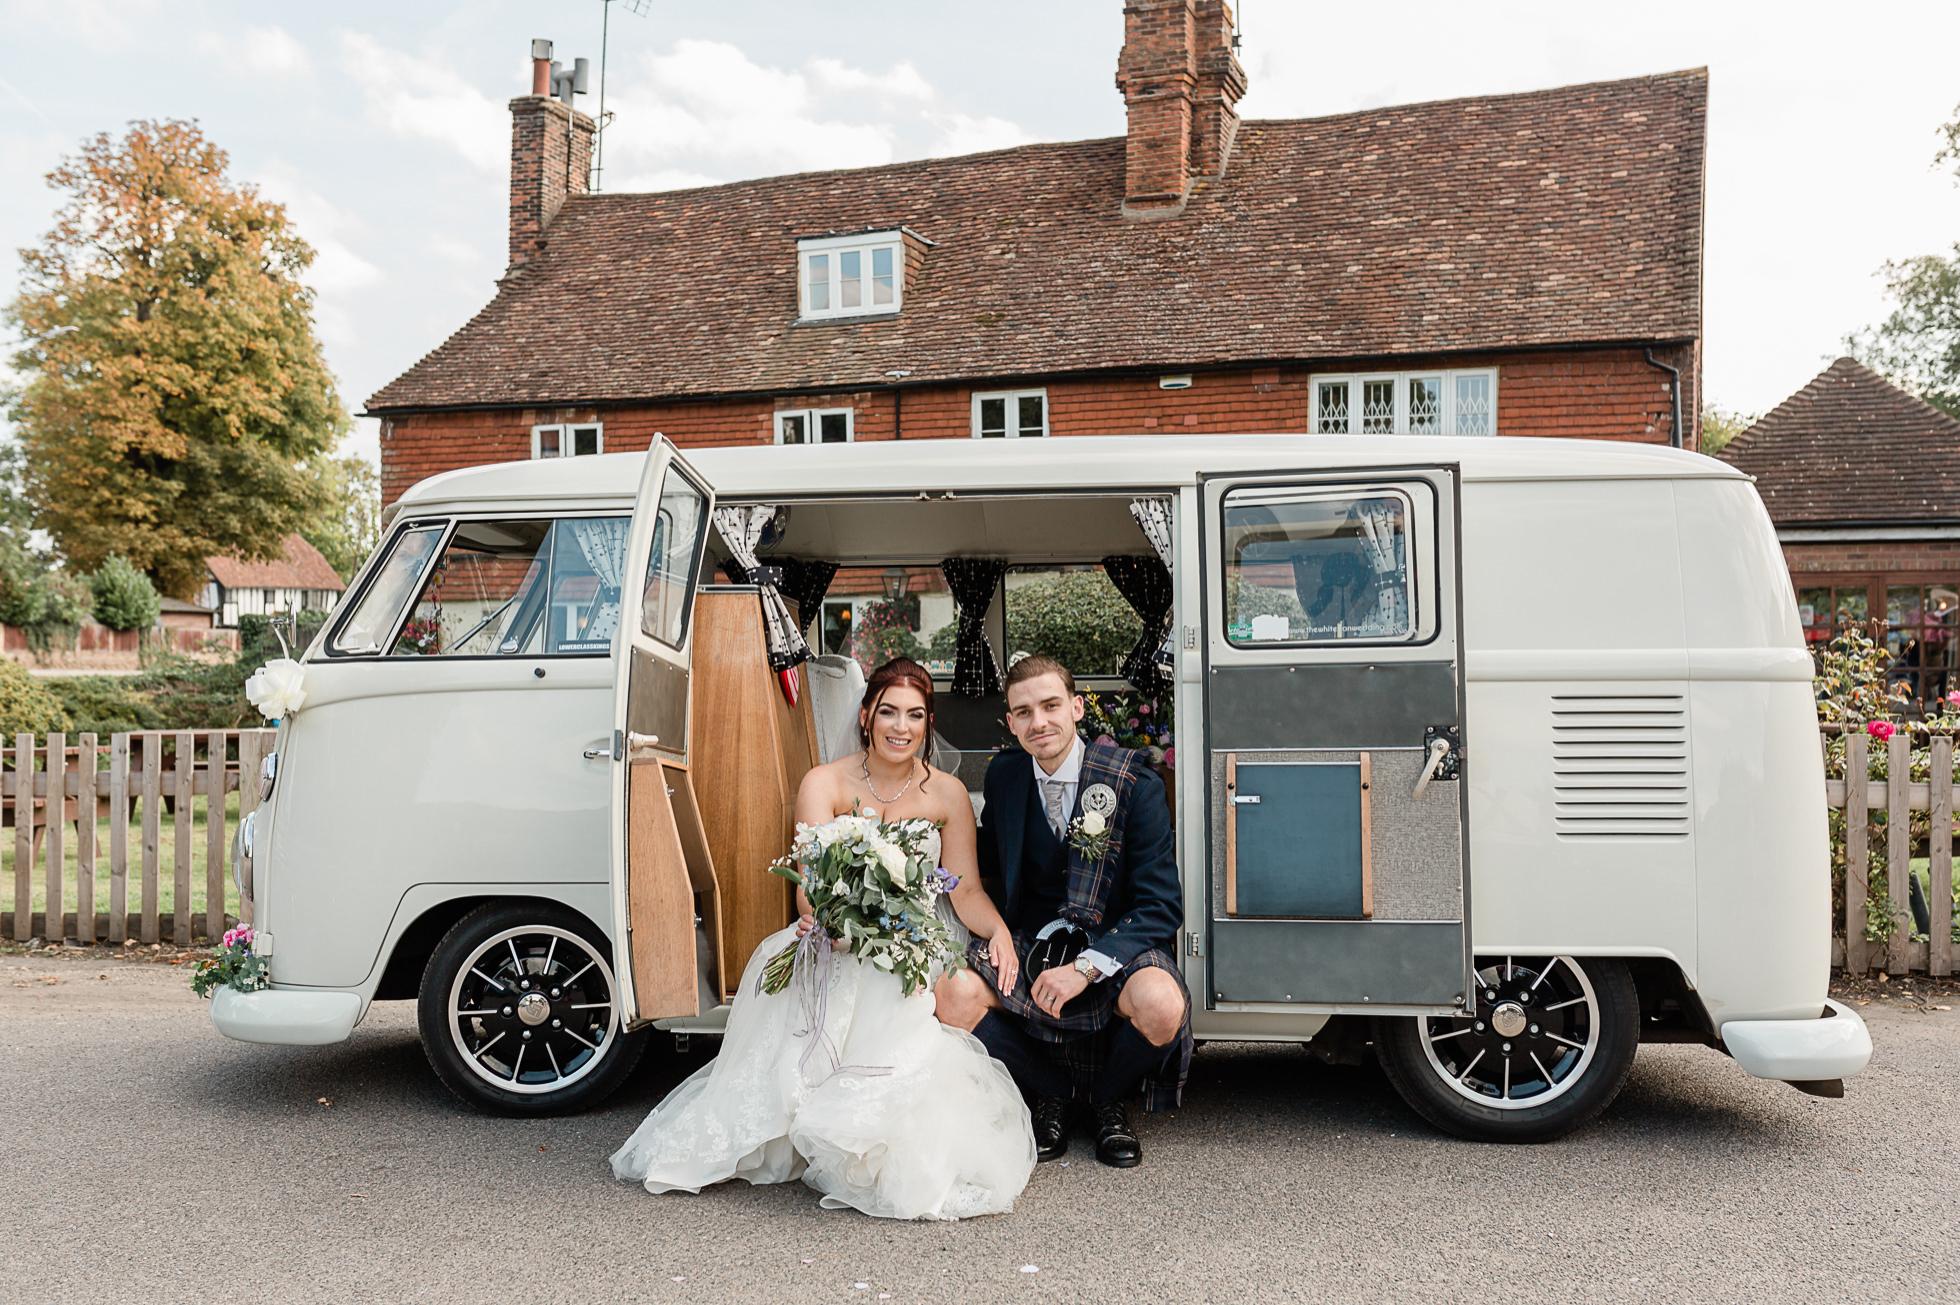 Wedding | The Moat Wrotham | Chloe & Connor